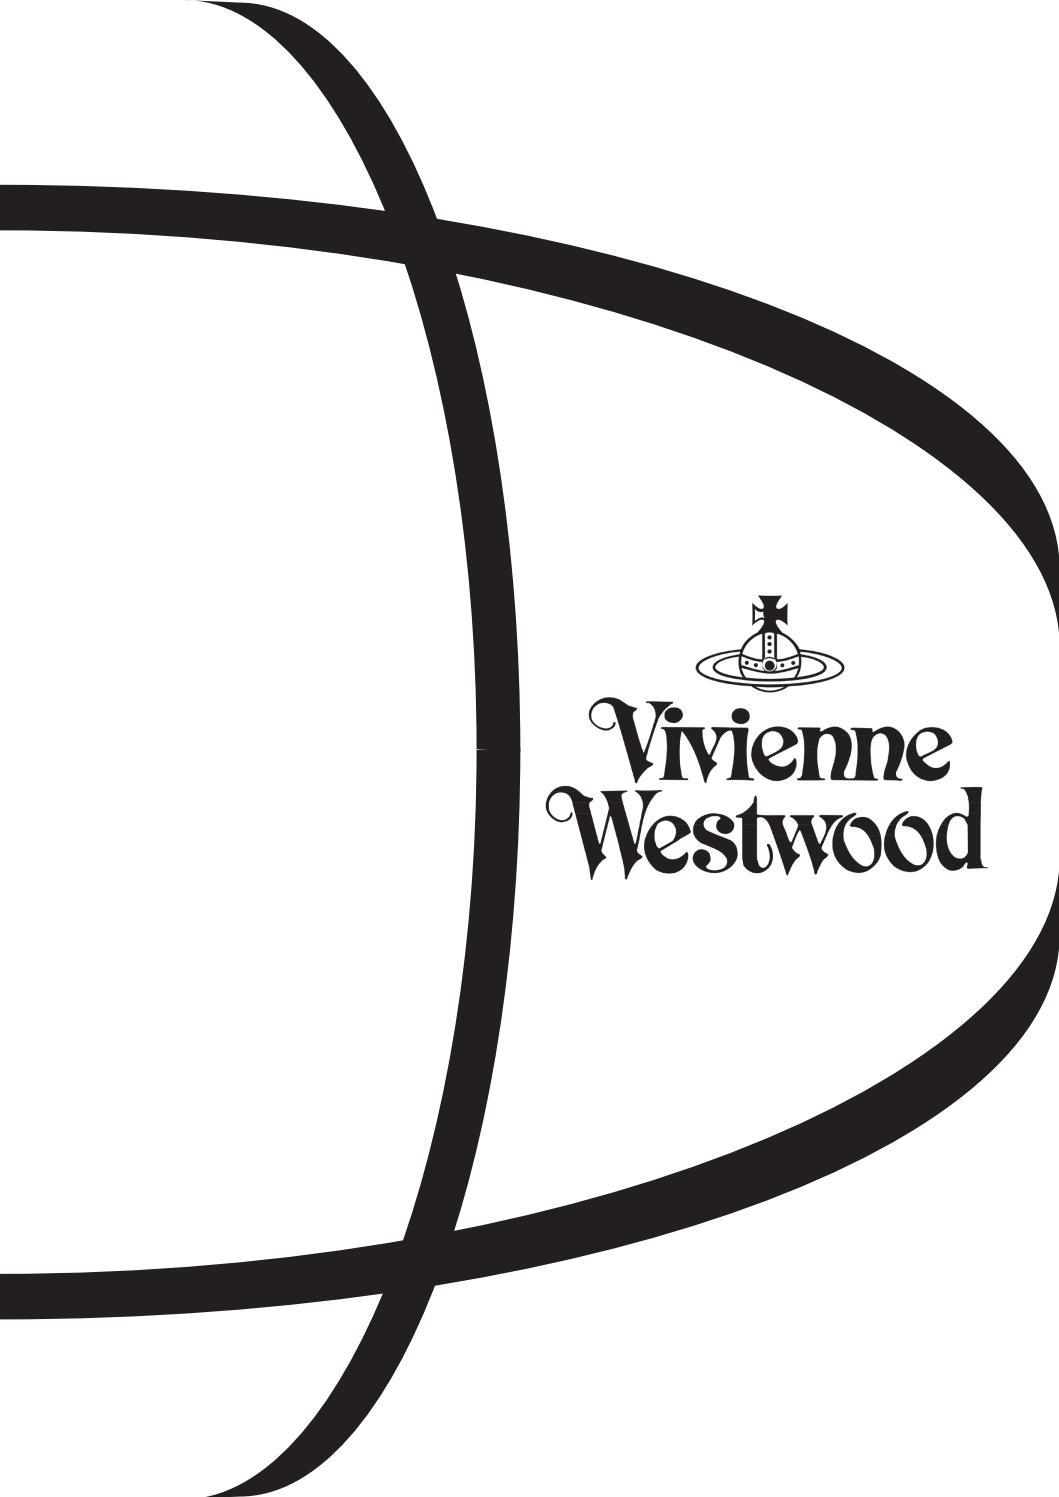 vivienne westwood customer profile